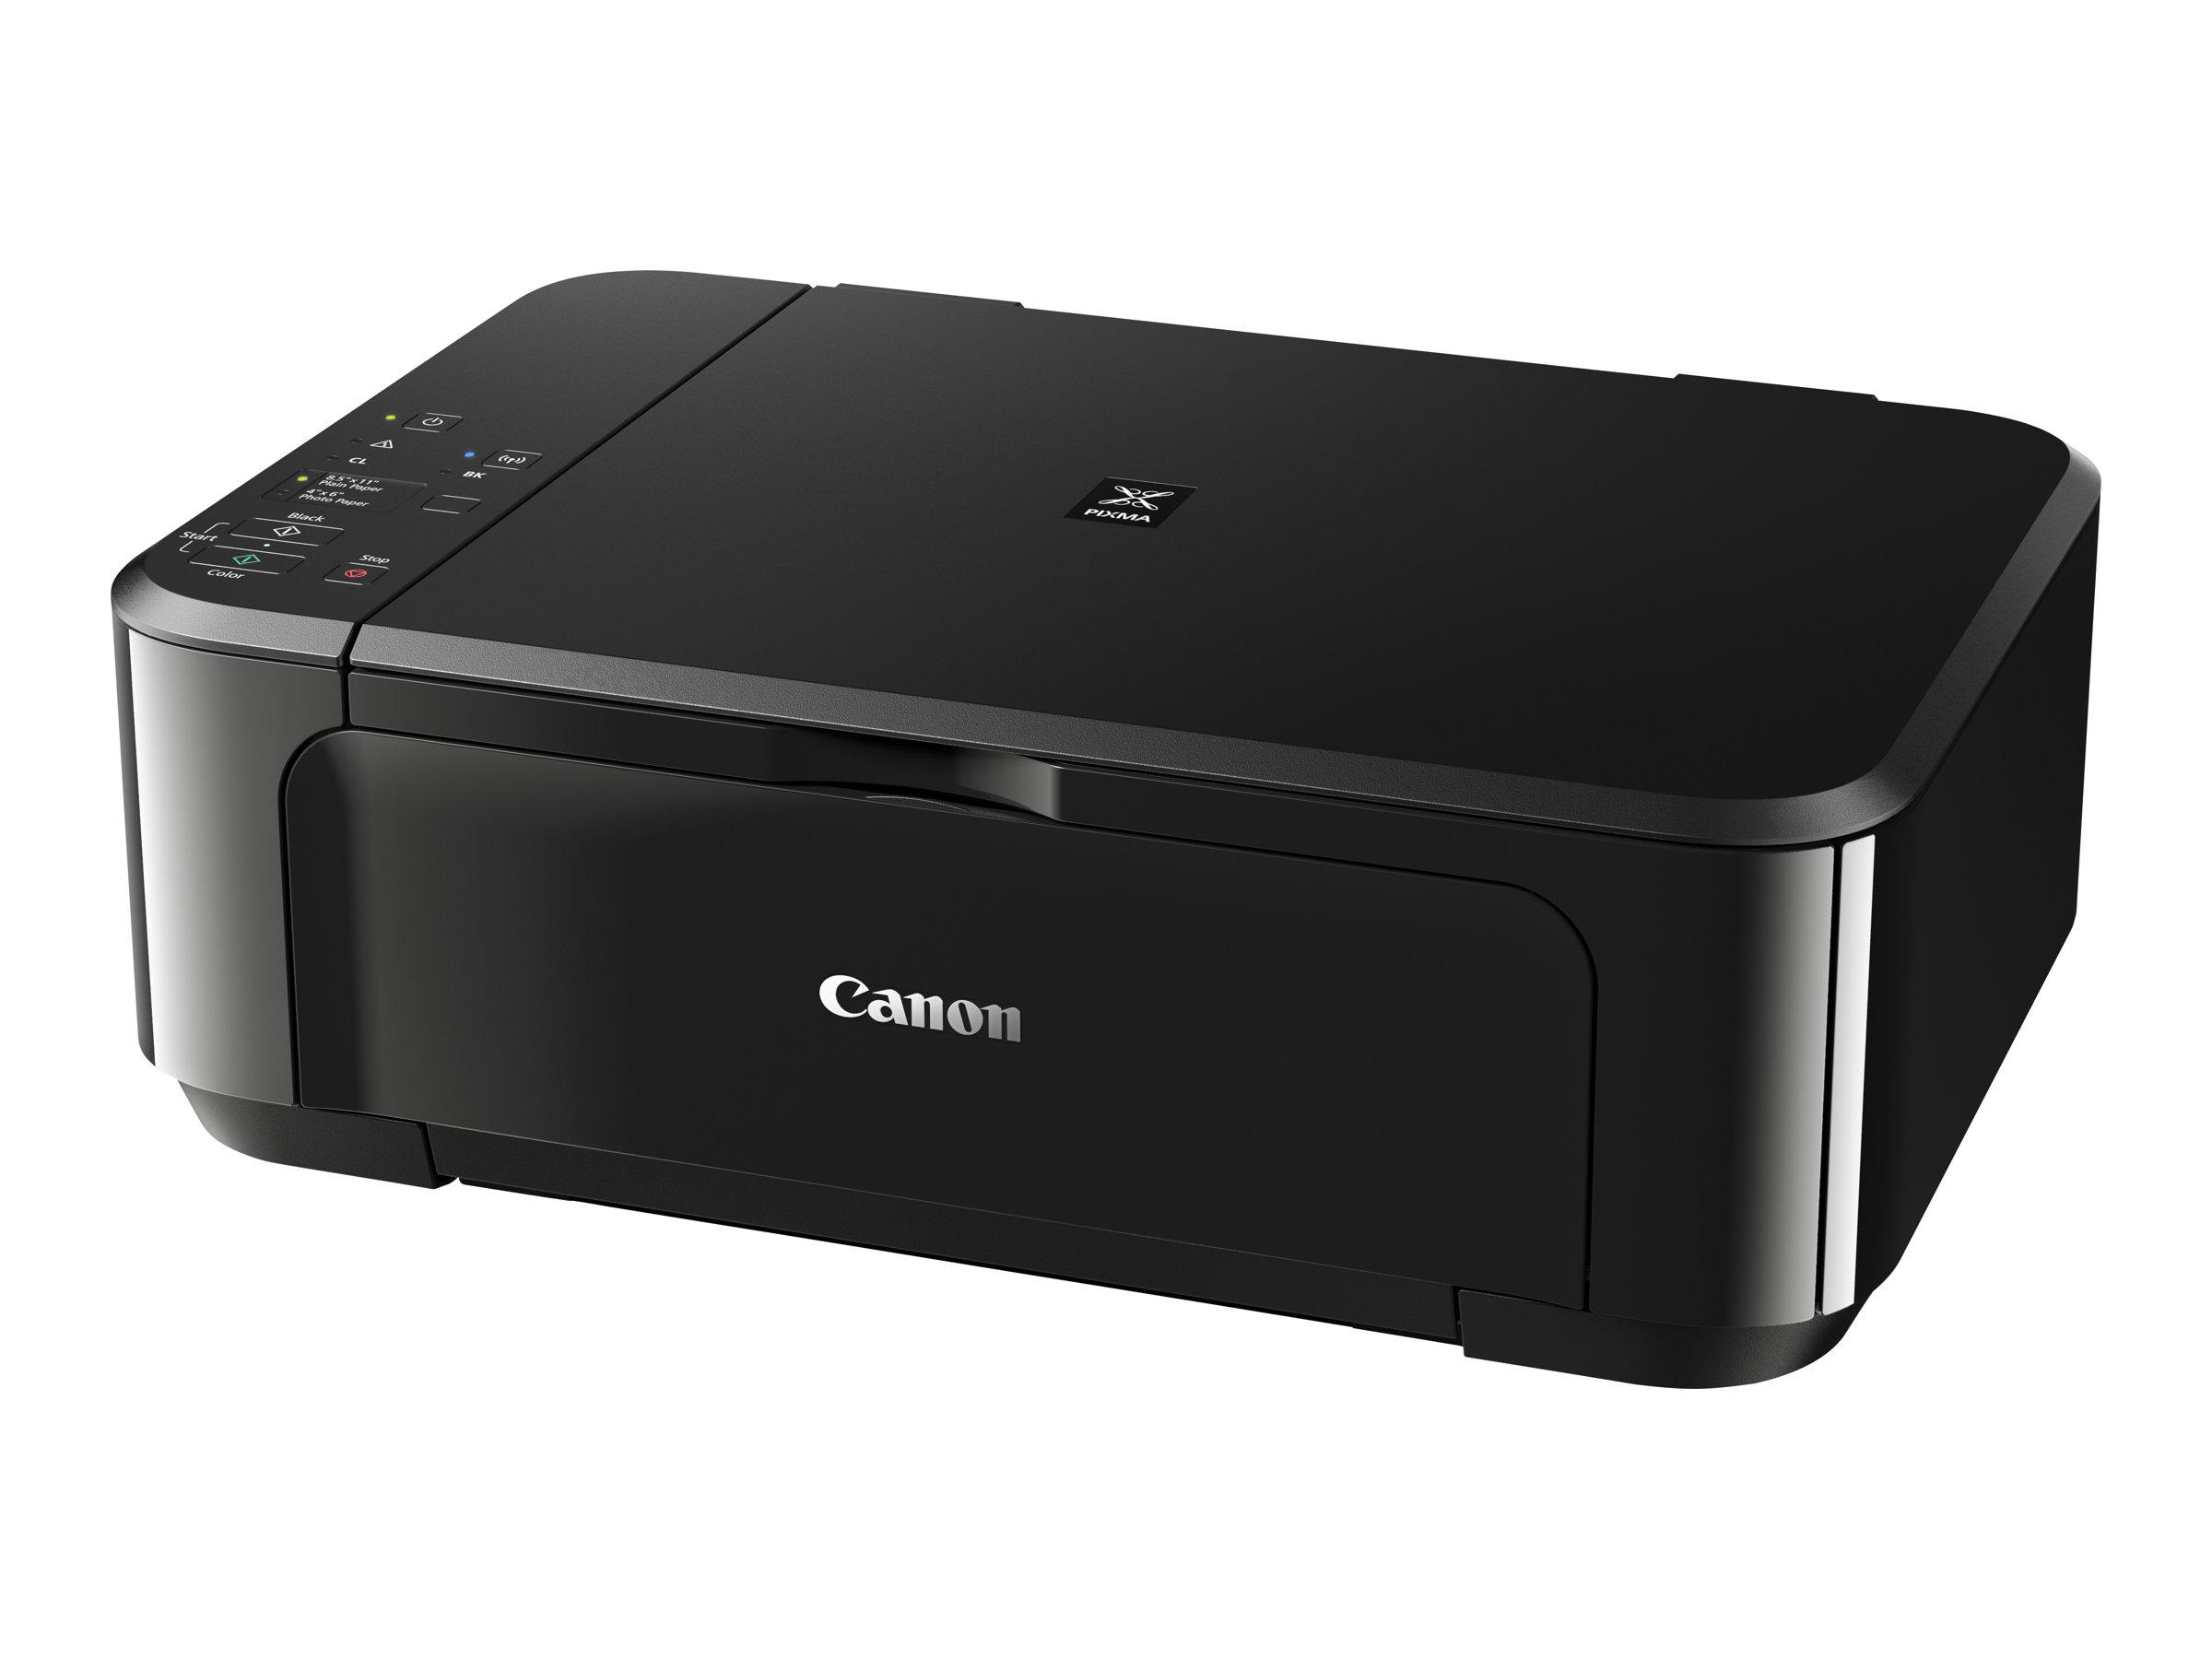 Canon PIXMA MG3650 - Multifunktionsdrucker